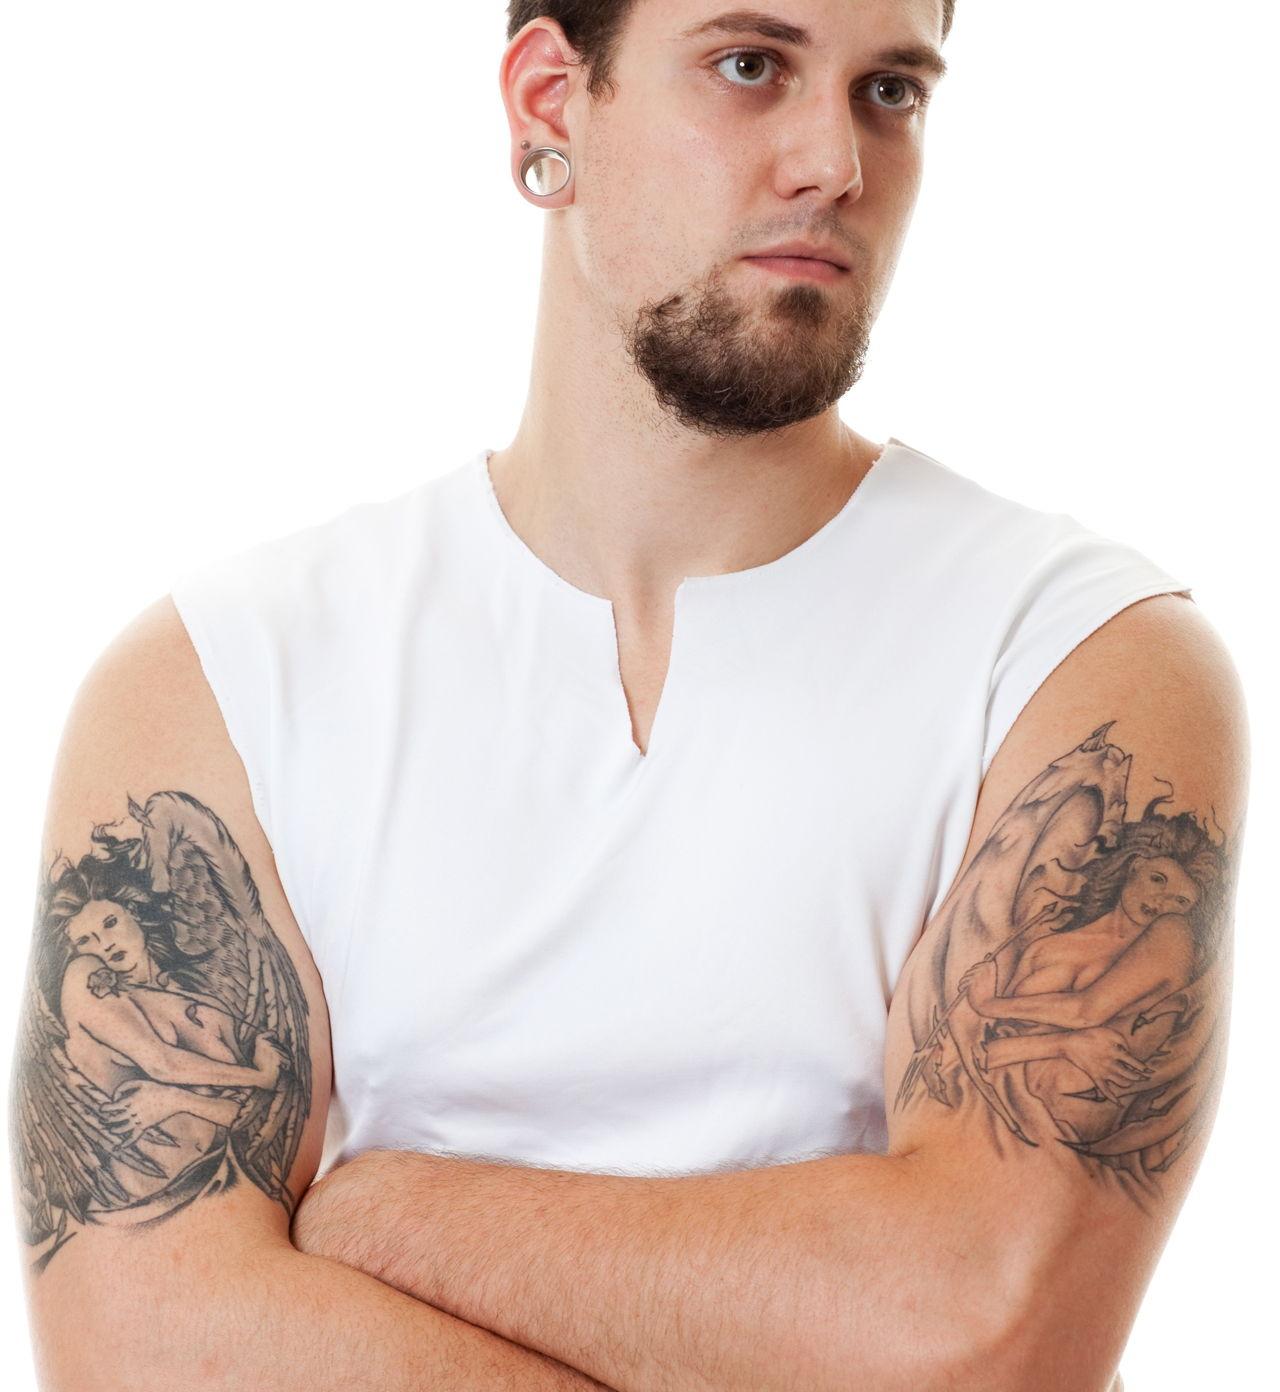 tattoo half young sleeve designs tattoos